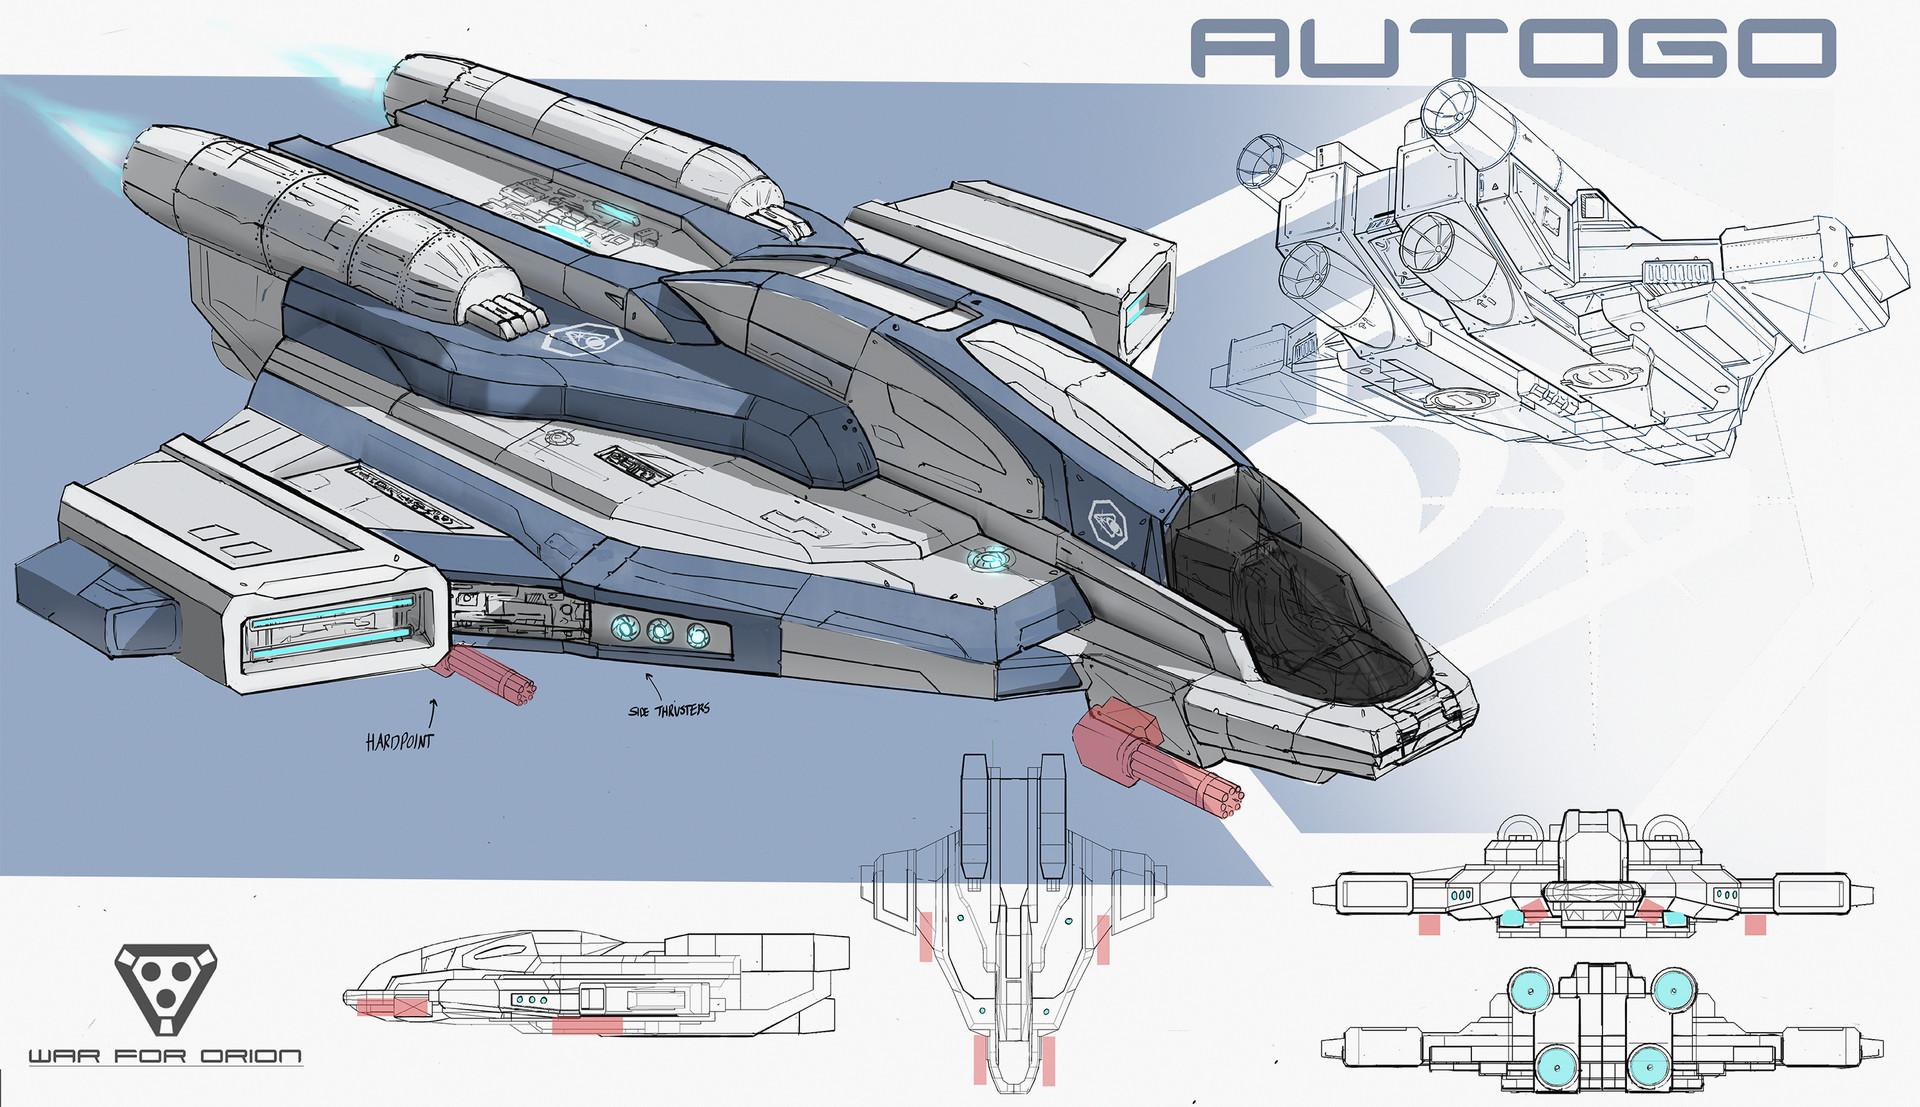 spaceship design by jasons21 - photo #7